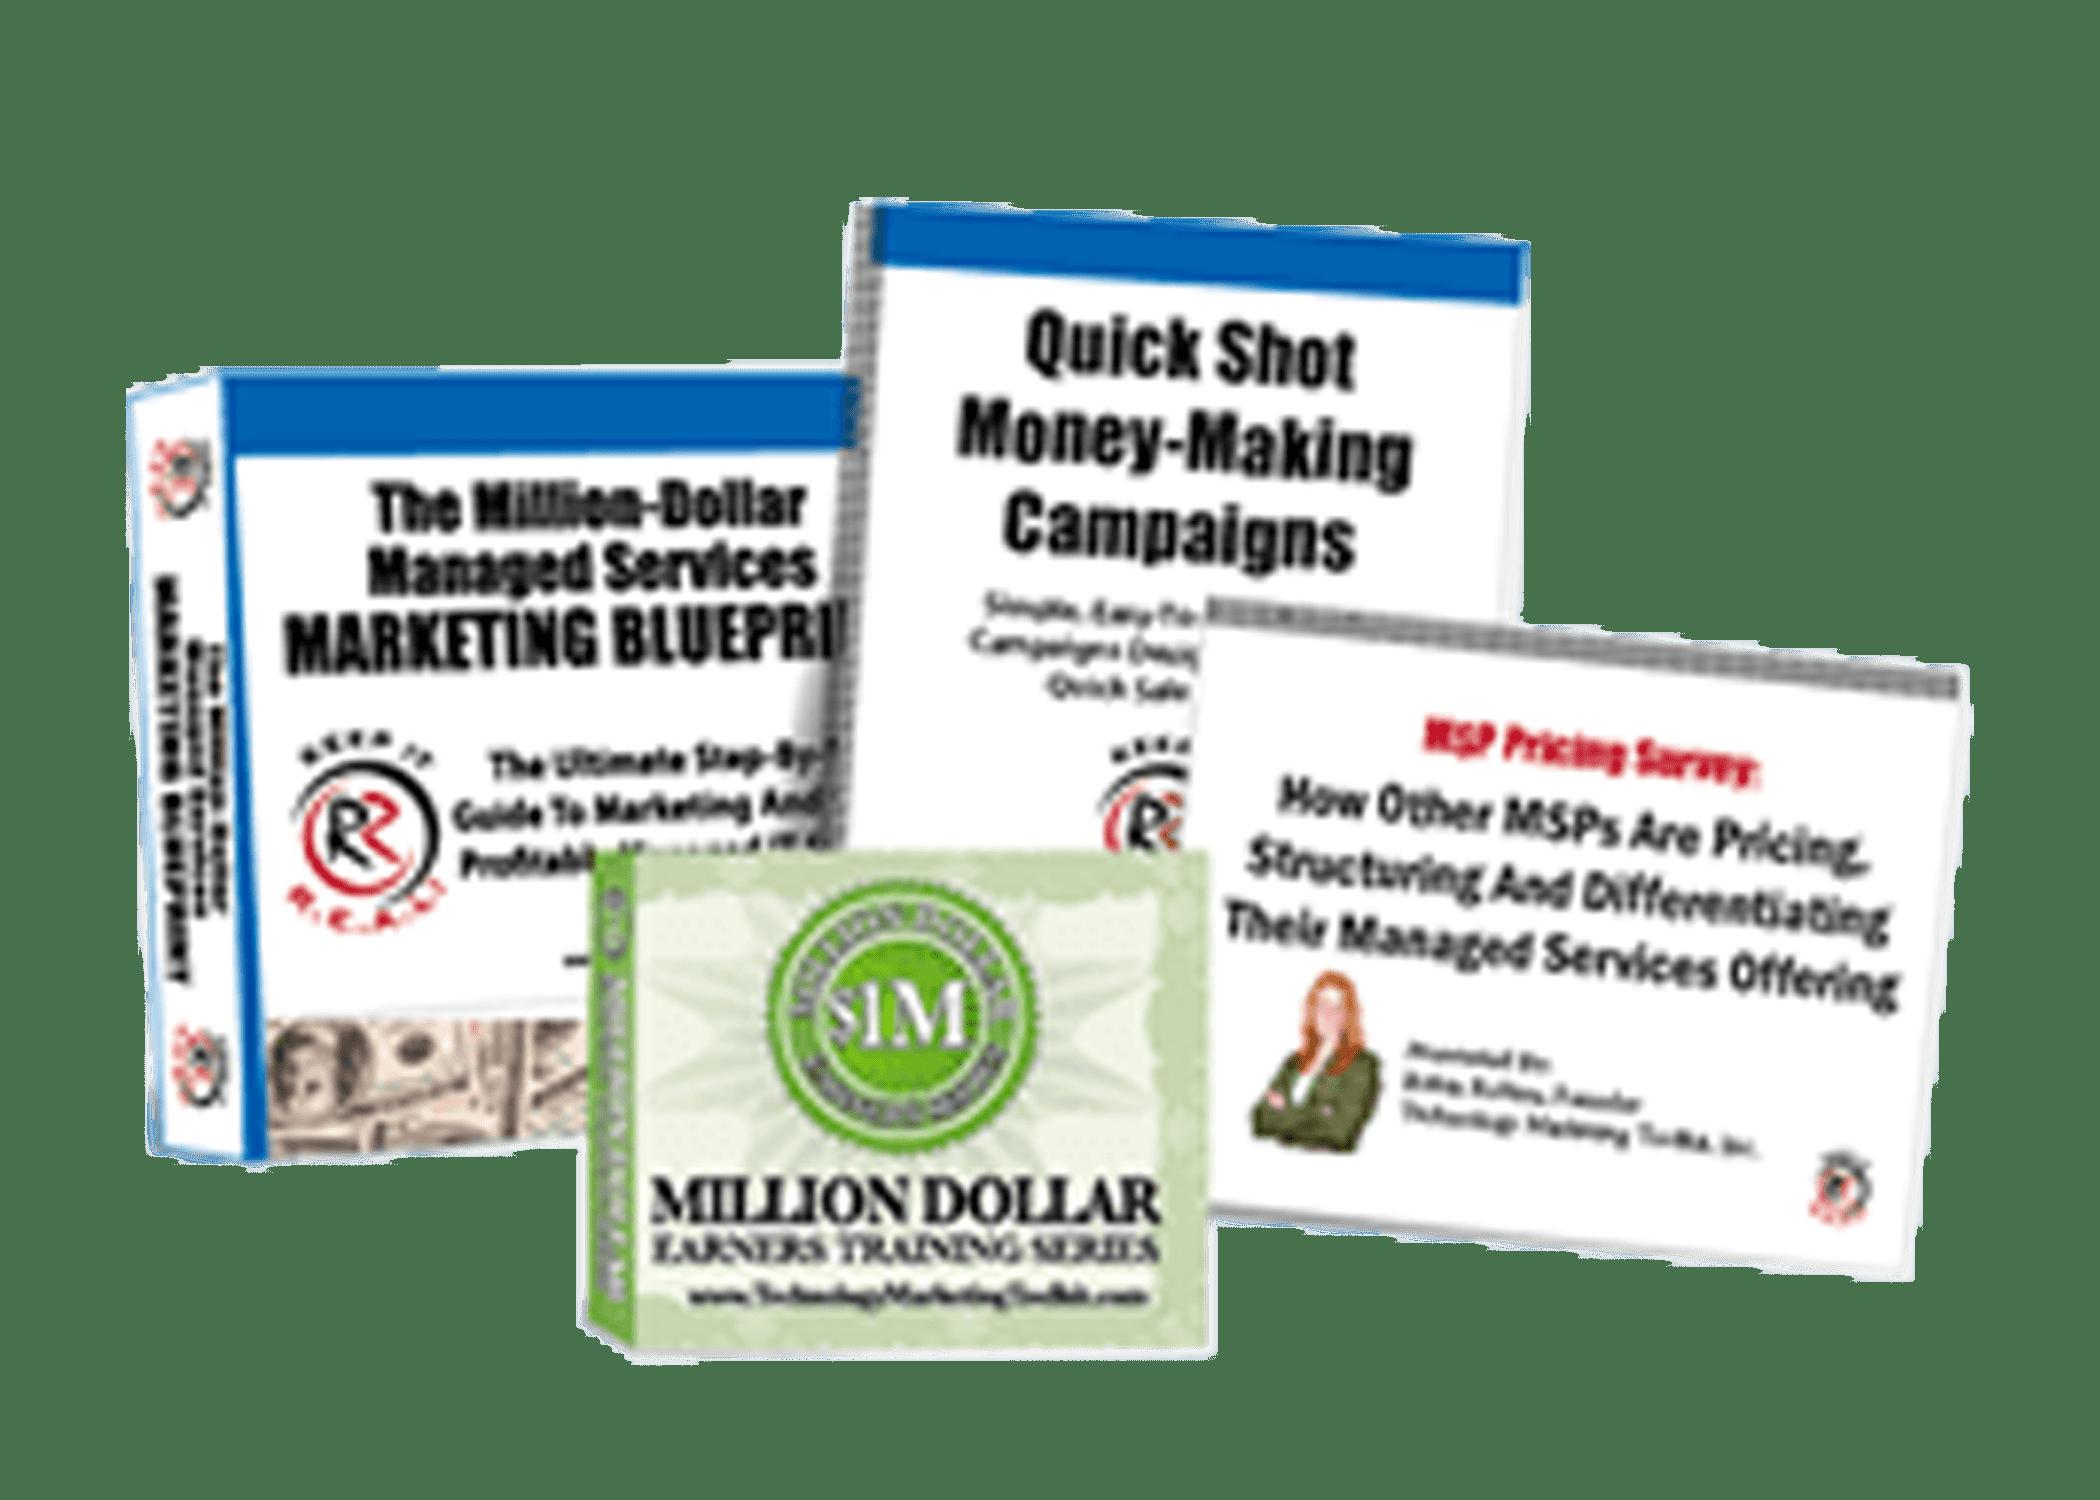 The Million-Dollar Managed Services Marketing Blueprint | Robin Robins